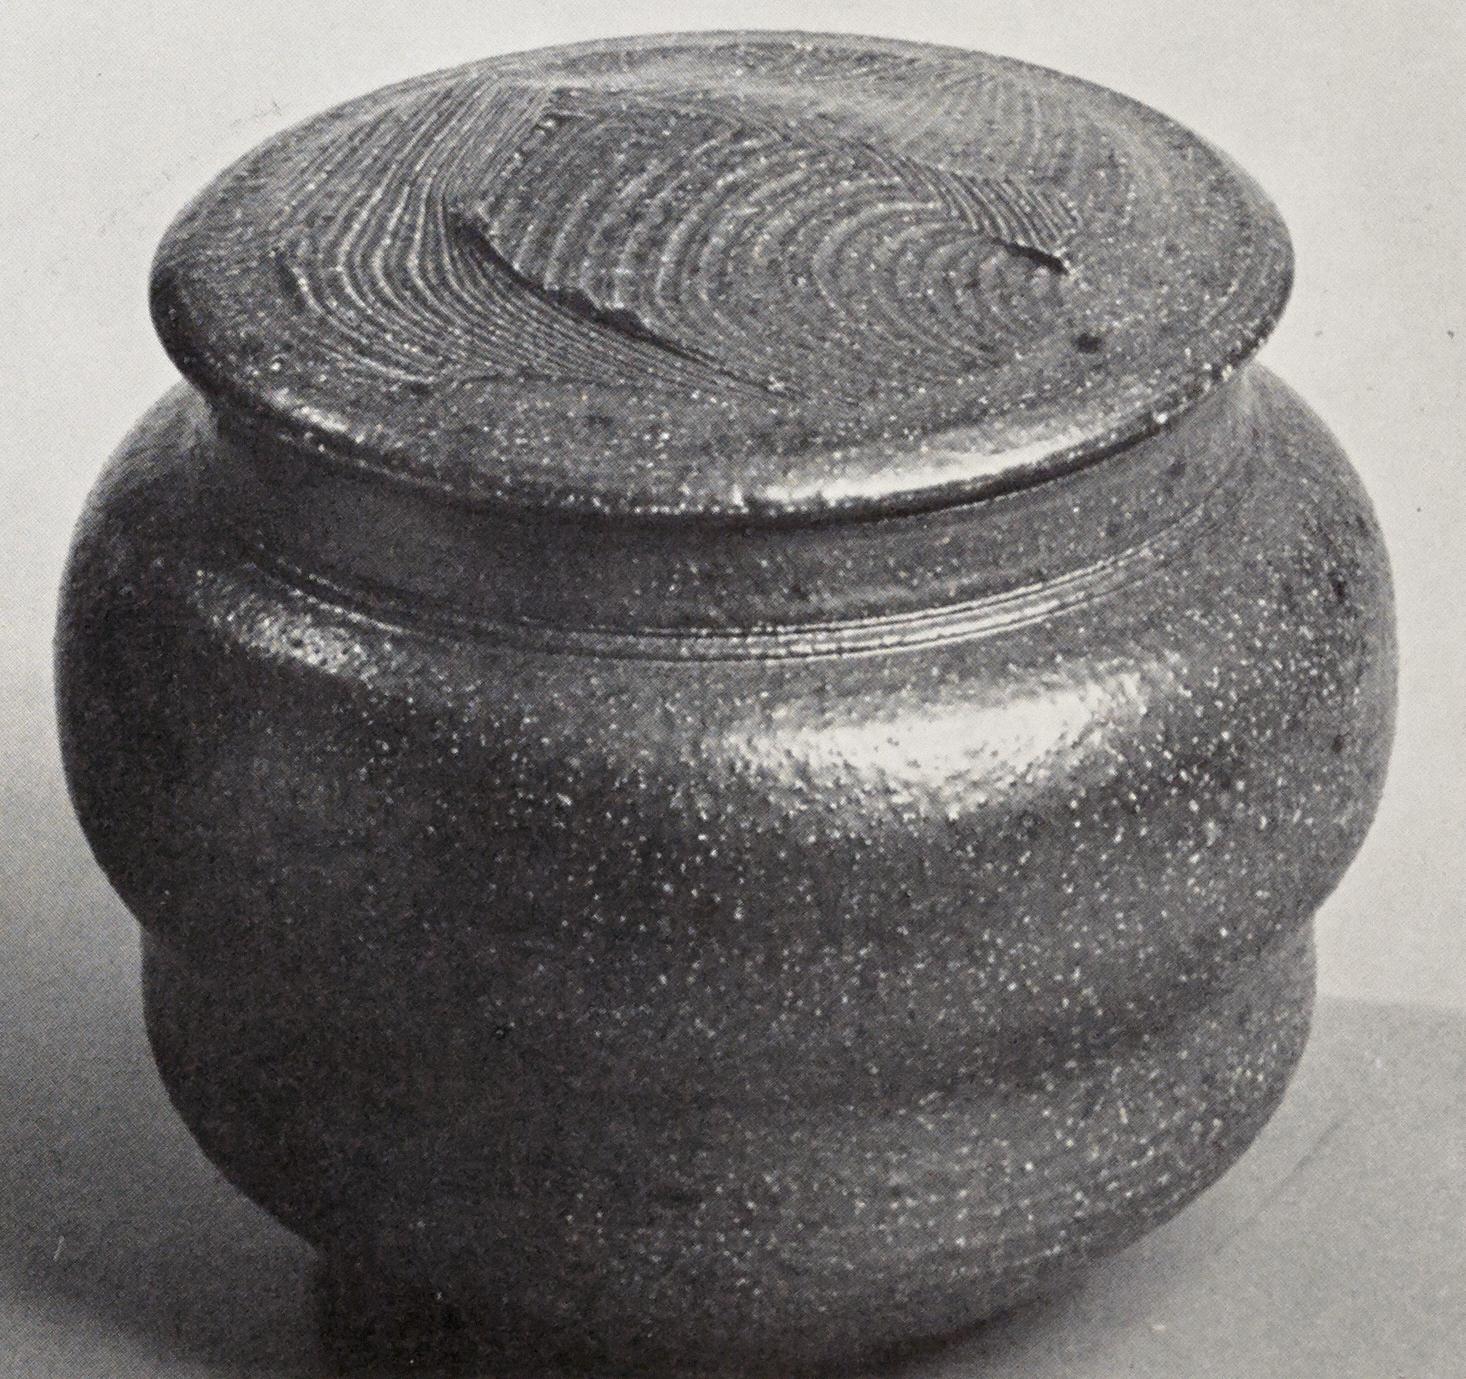 Karen Karnes, Covered Jar, Photograph by Pete Sabin, Vol. 6, No. 1, 1977.